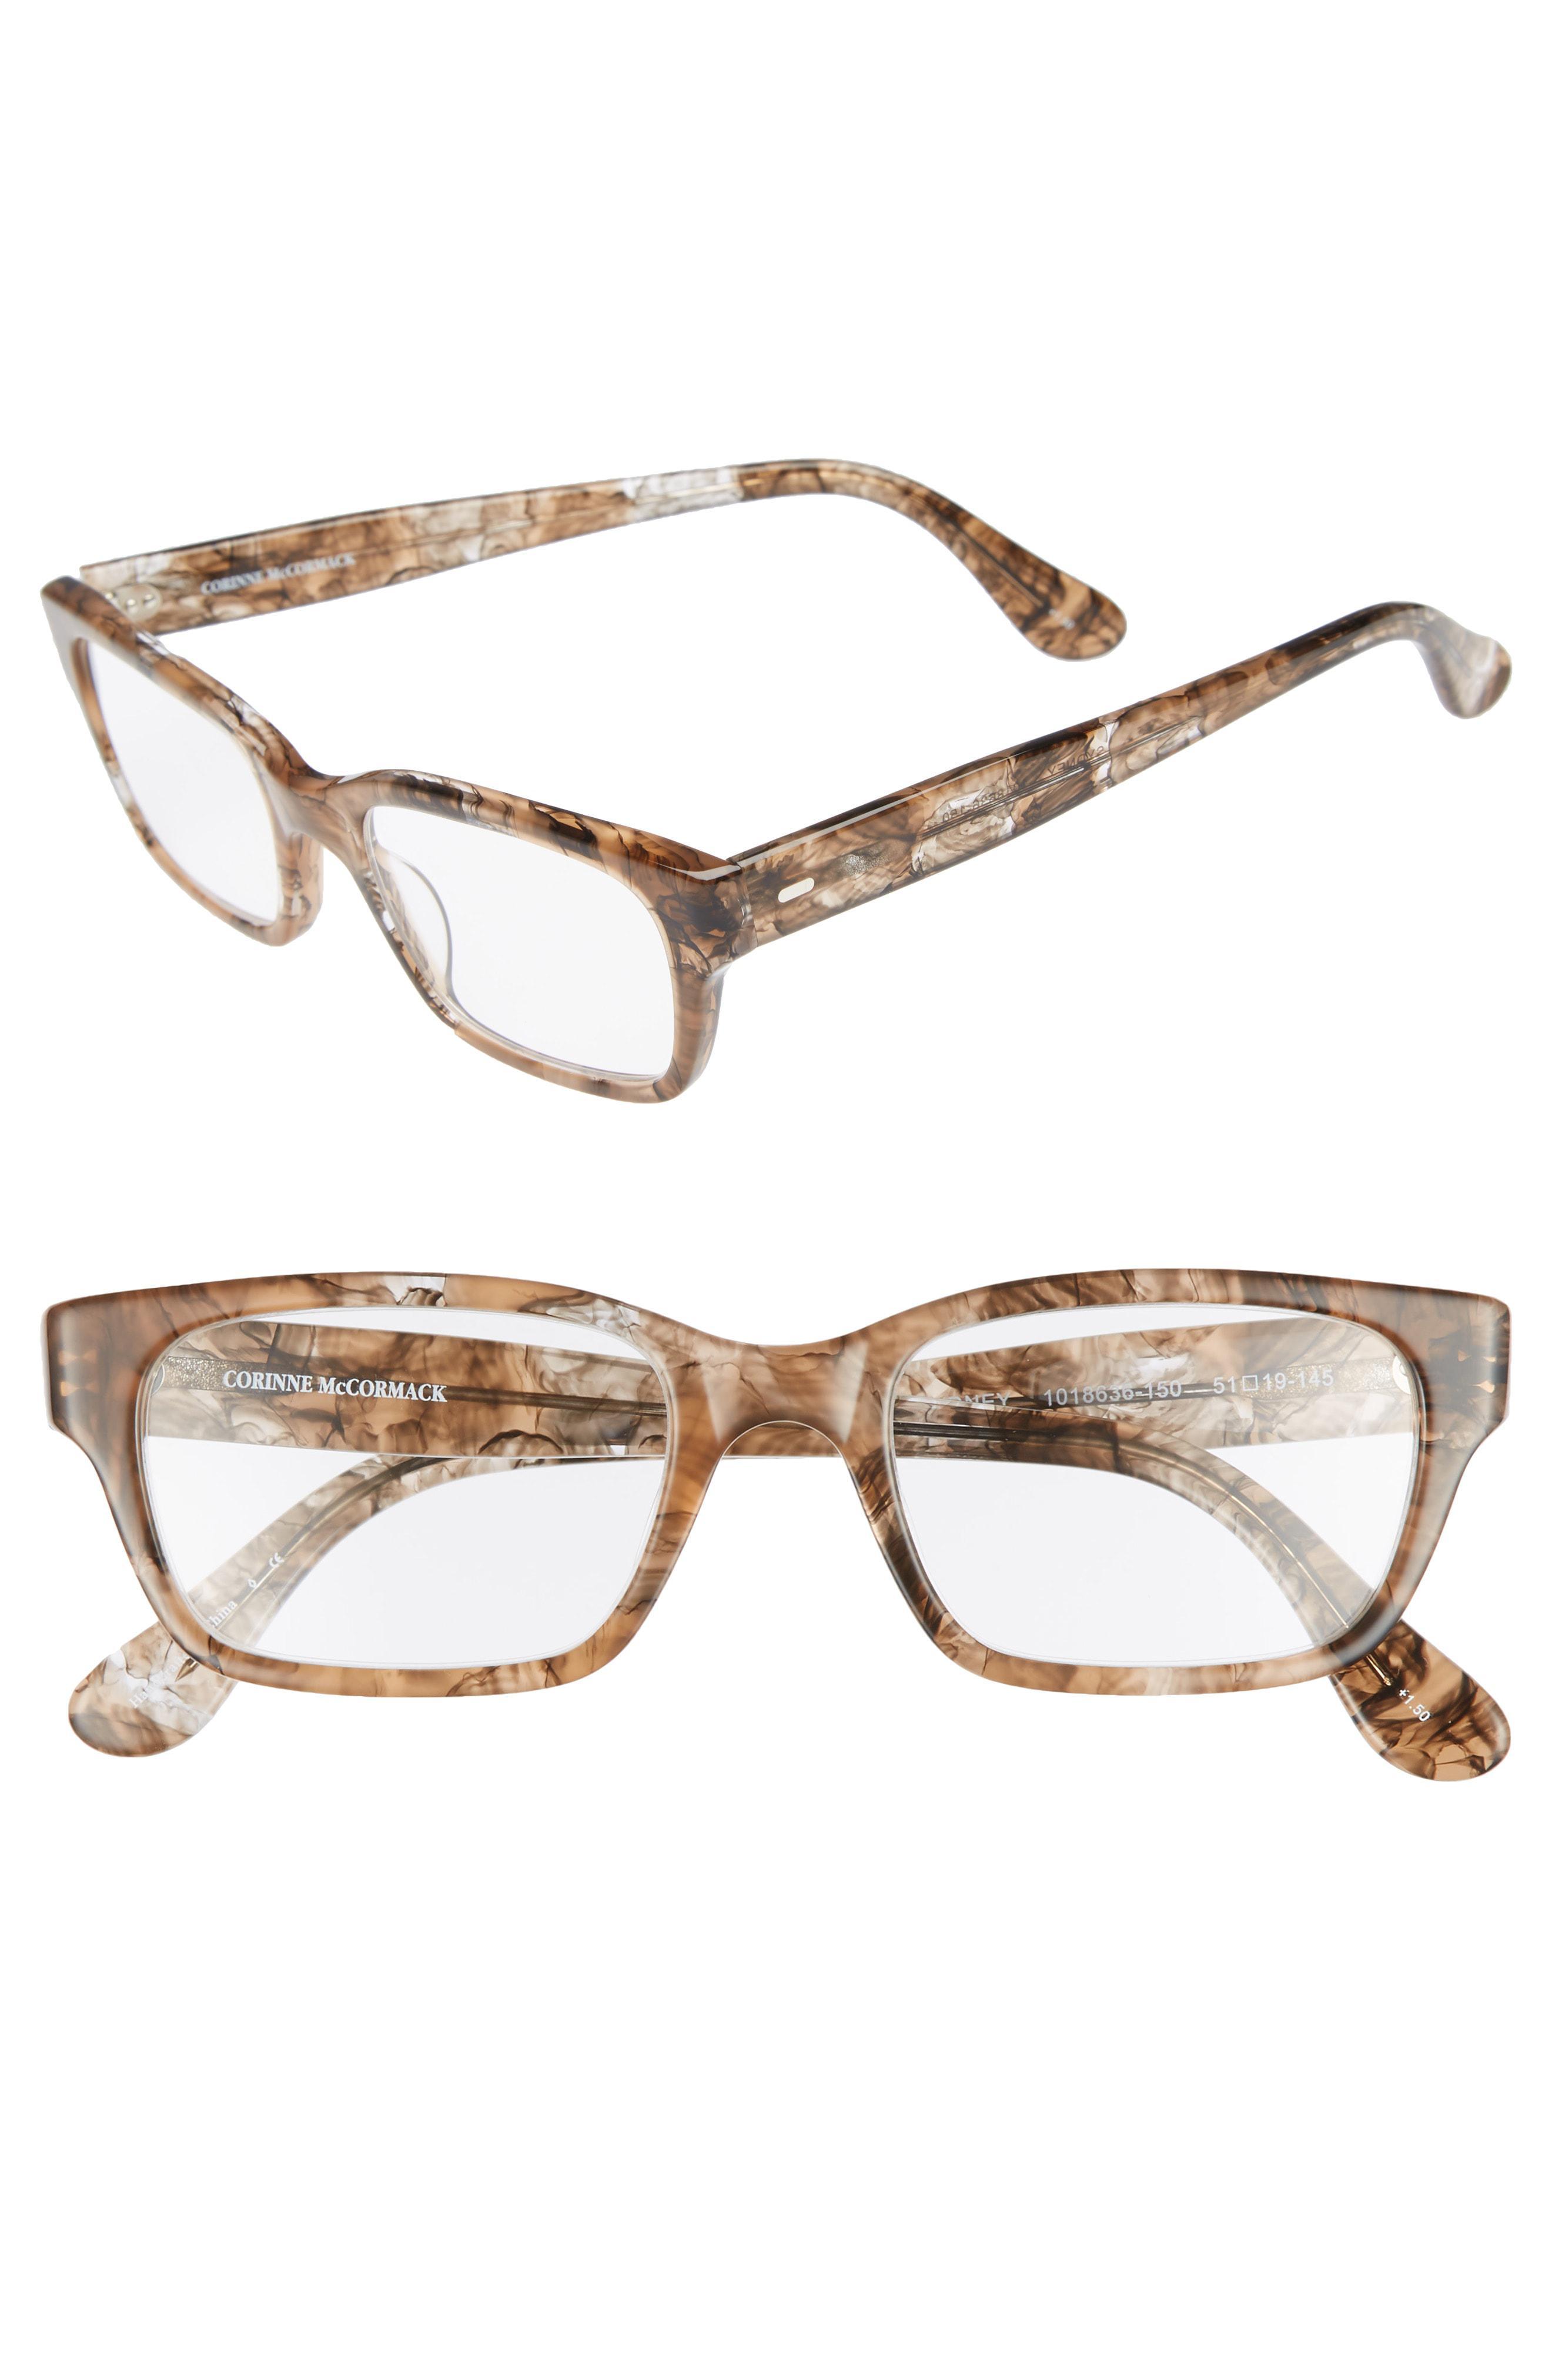 bad099804c54 Corinne Mccormack - Metallic  sydney  51mm Reading Glasses - Transparent  Marble - Lyst. View fullscreen